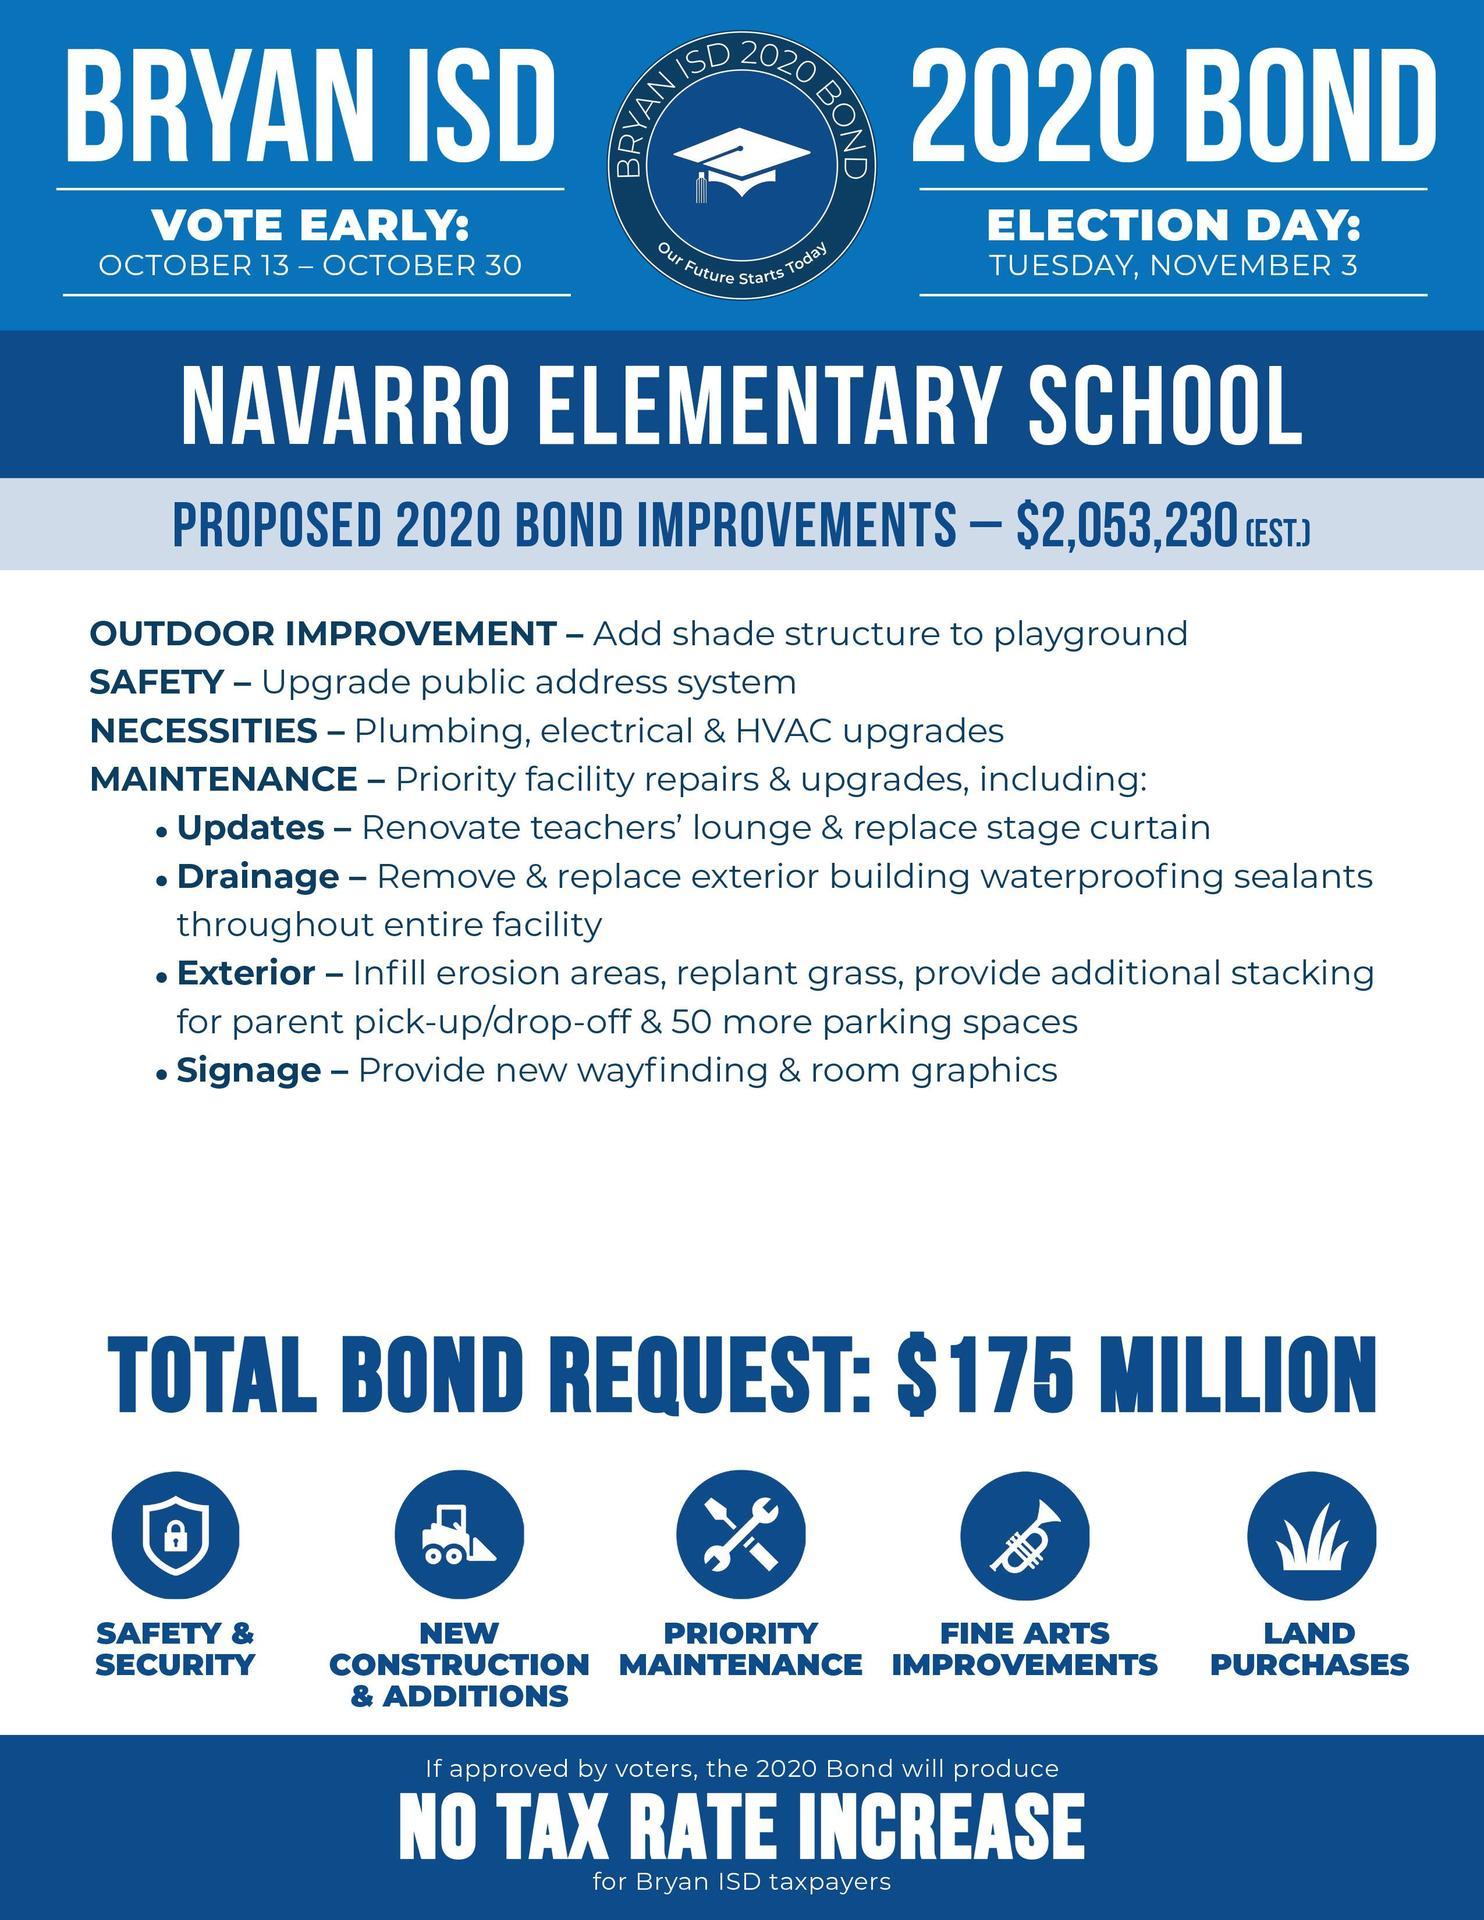 Navarro Elementary School Bond Information